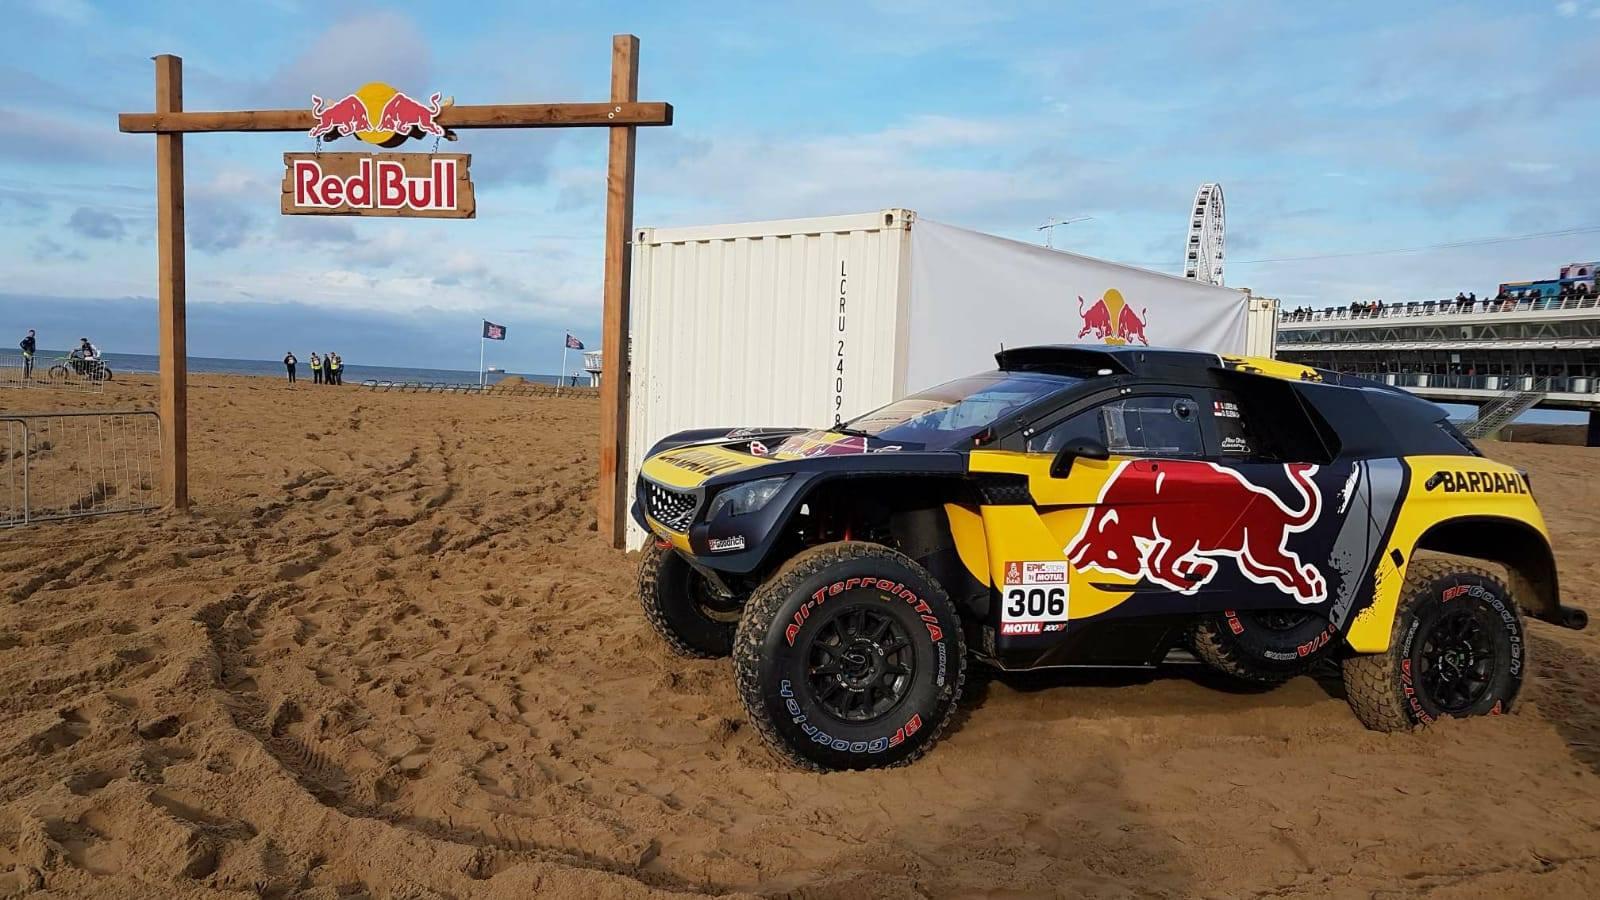 2017 Rallye Raid Dakar Paraguay - Bolivia - Argentina [2-14 Enero] - Página 38 DruG7dRWkAcy6uo